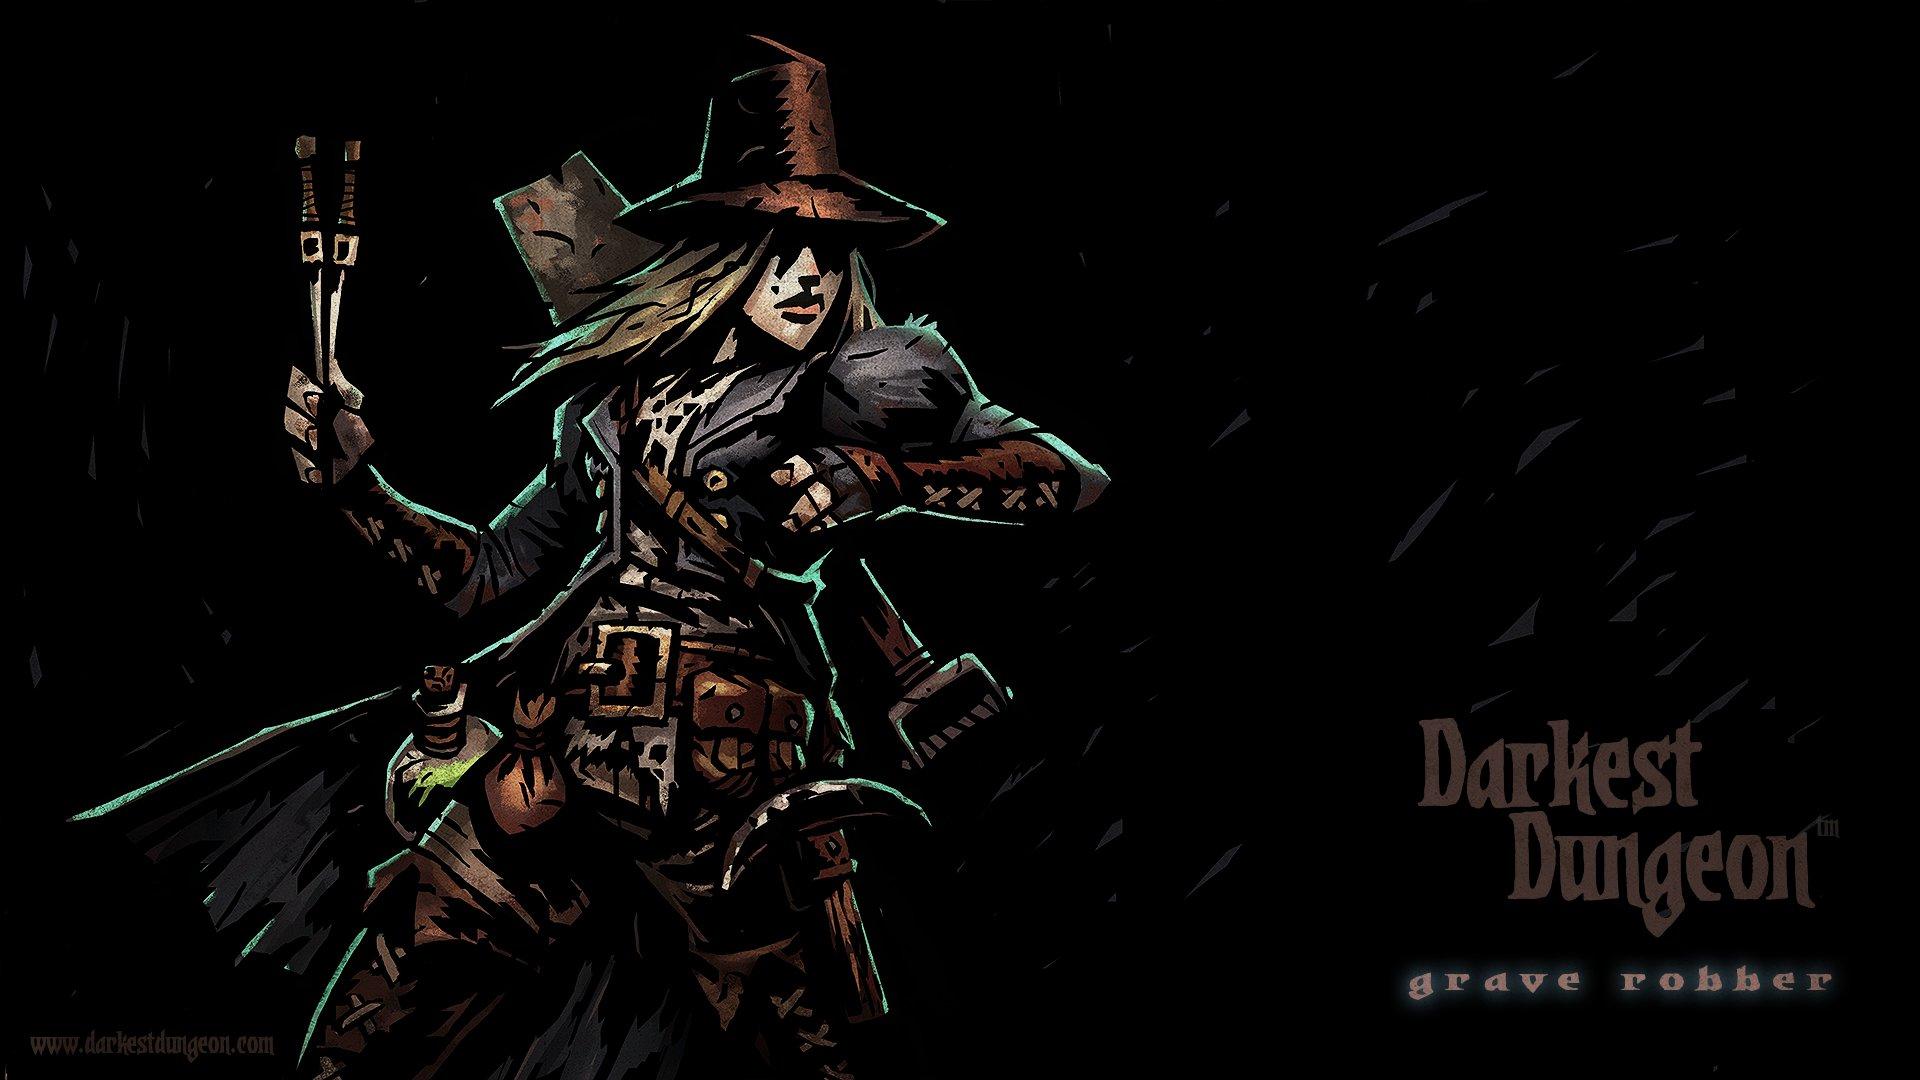 http://www.lightninggamingnews.com/wp-content/uploads/2014/03/Meet-Darkest-Dungeon%E2%80%99s-Grave-Robber.jpg